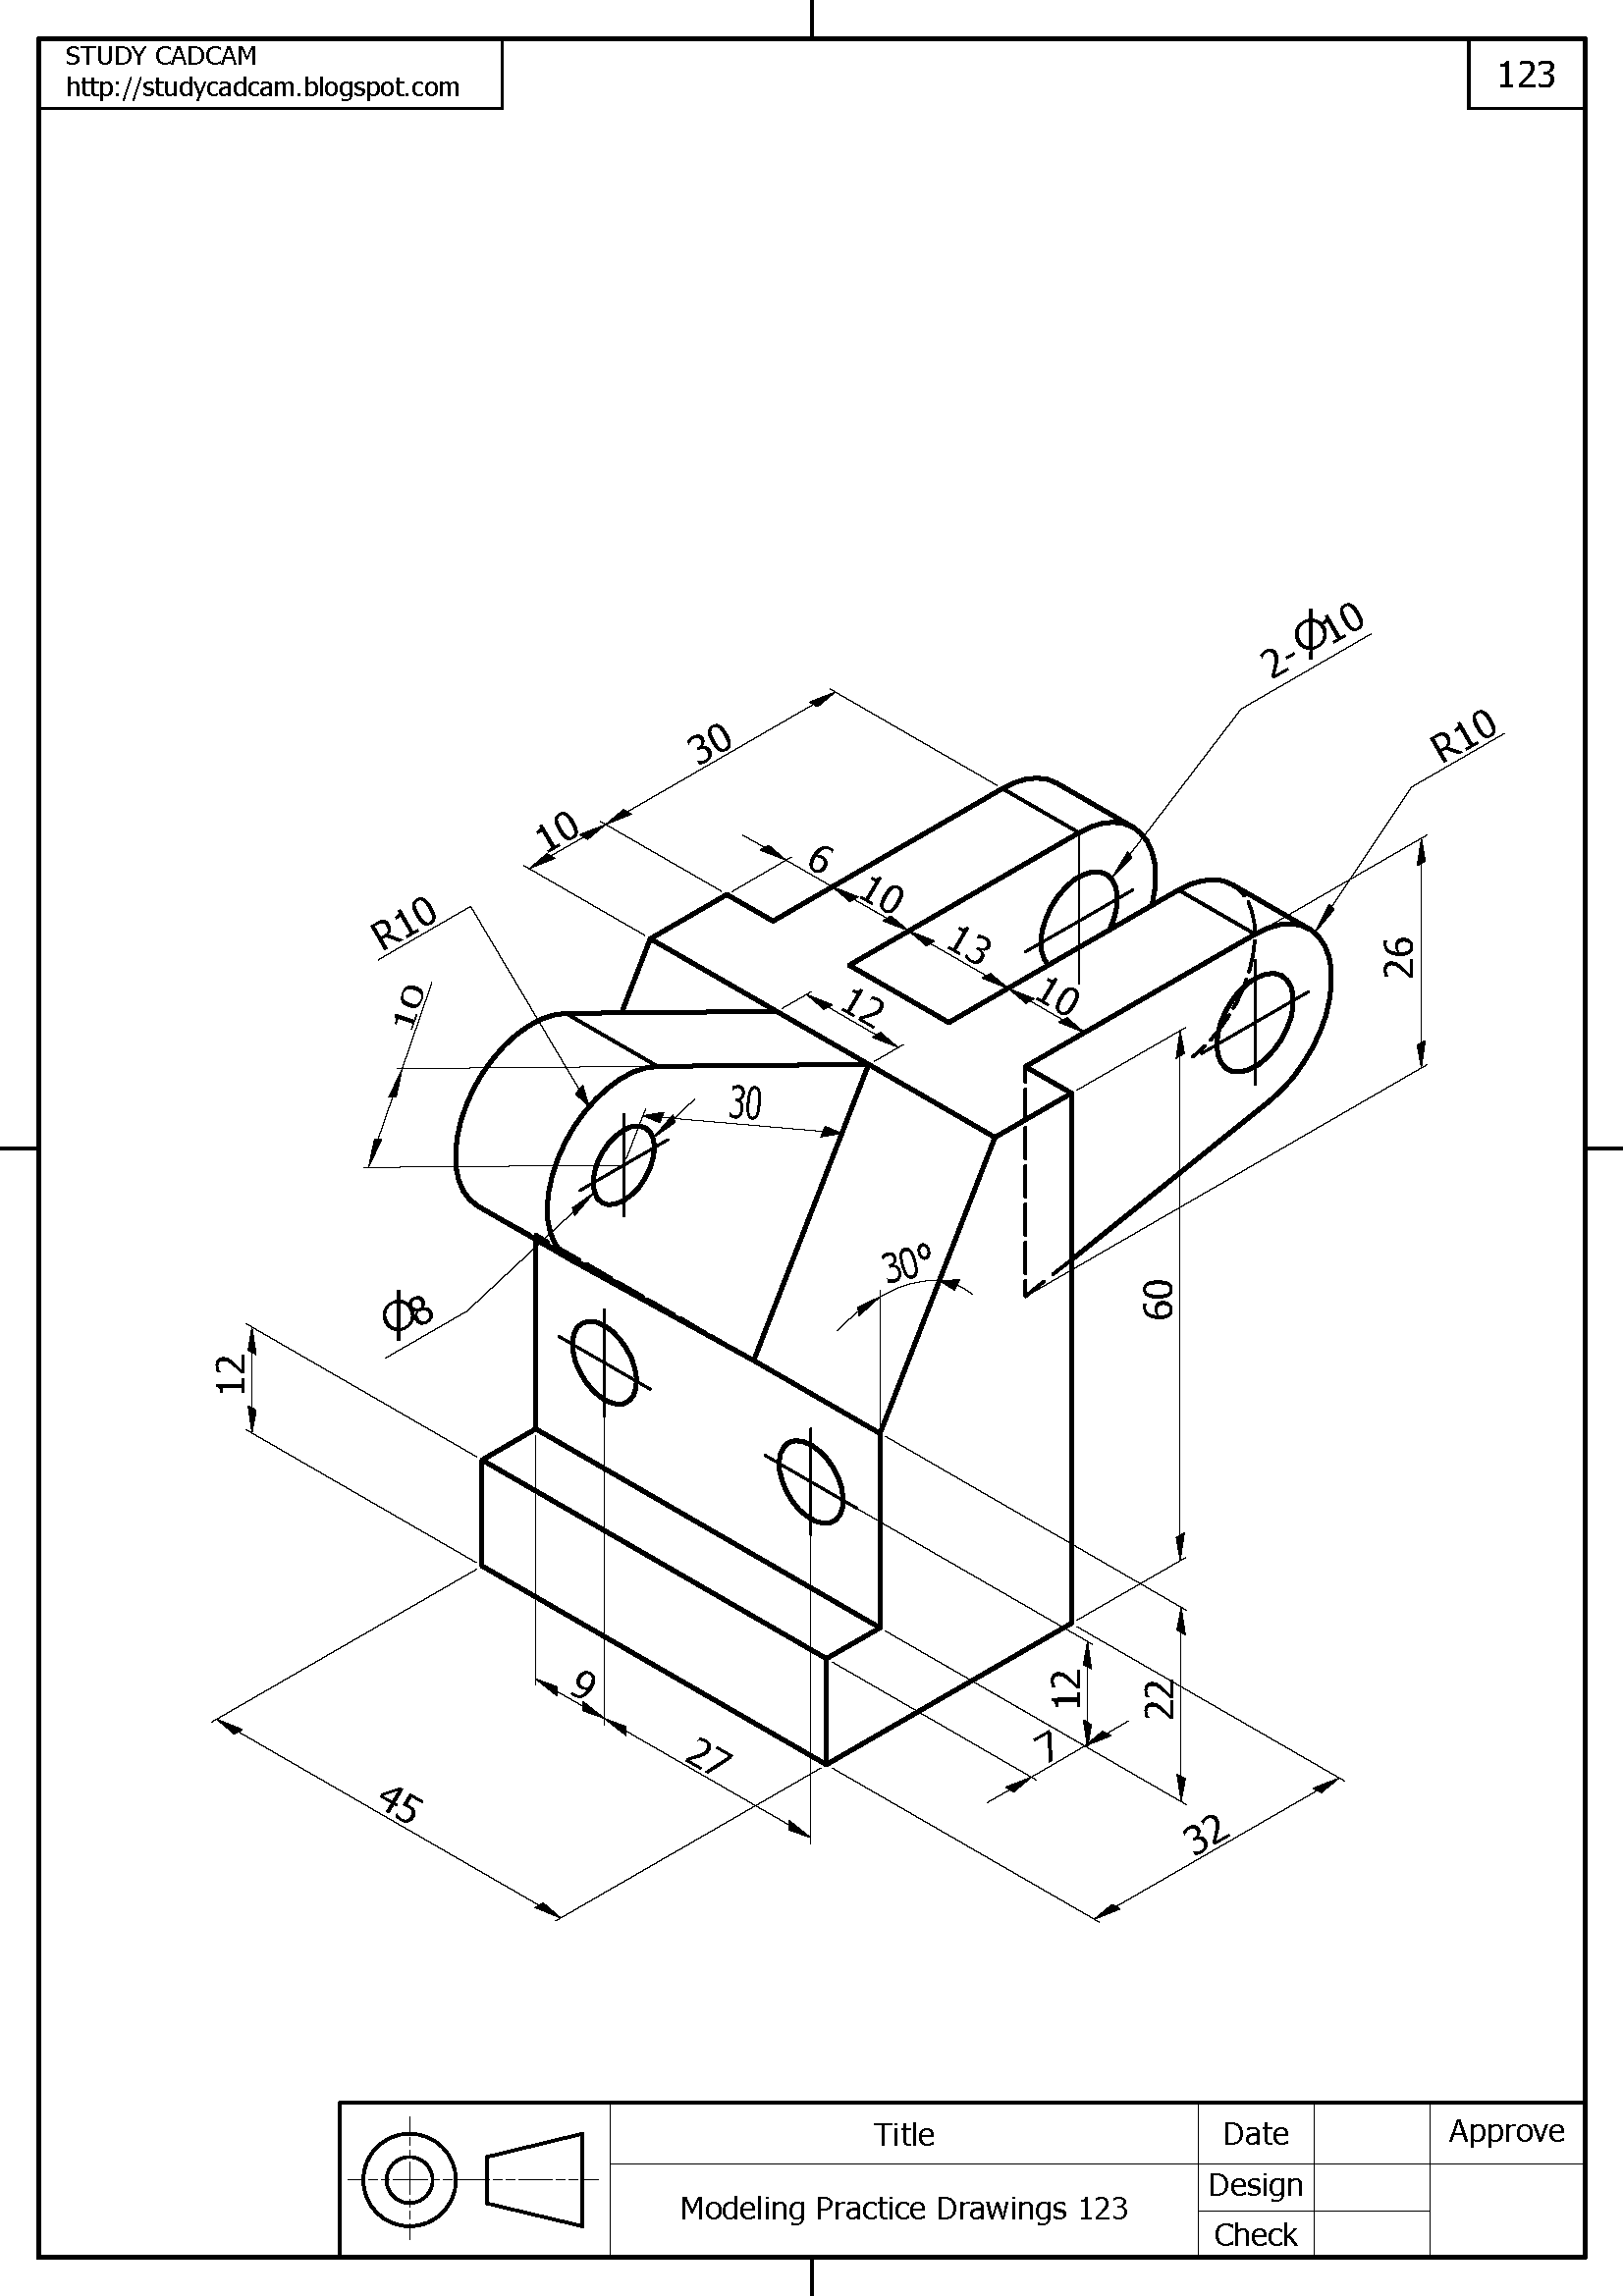 Autocad 3d Modeling Practice